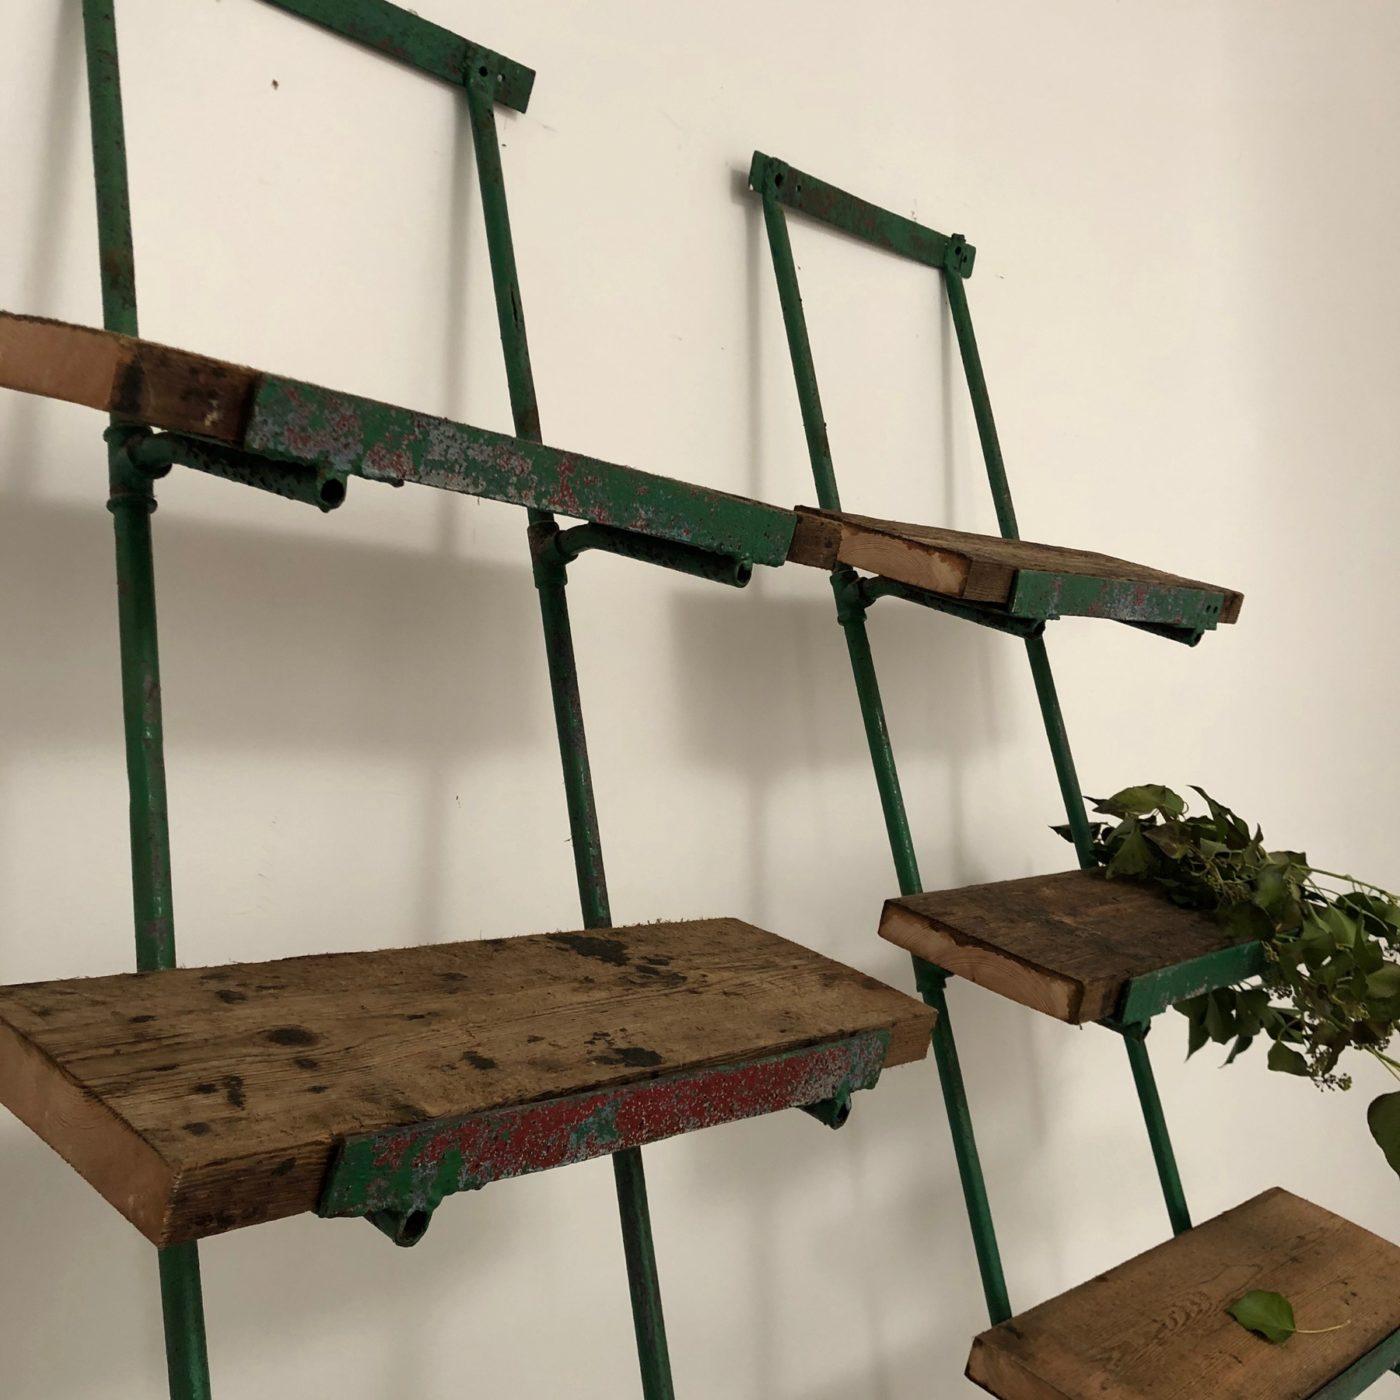 flower-shop-shelves0008